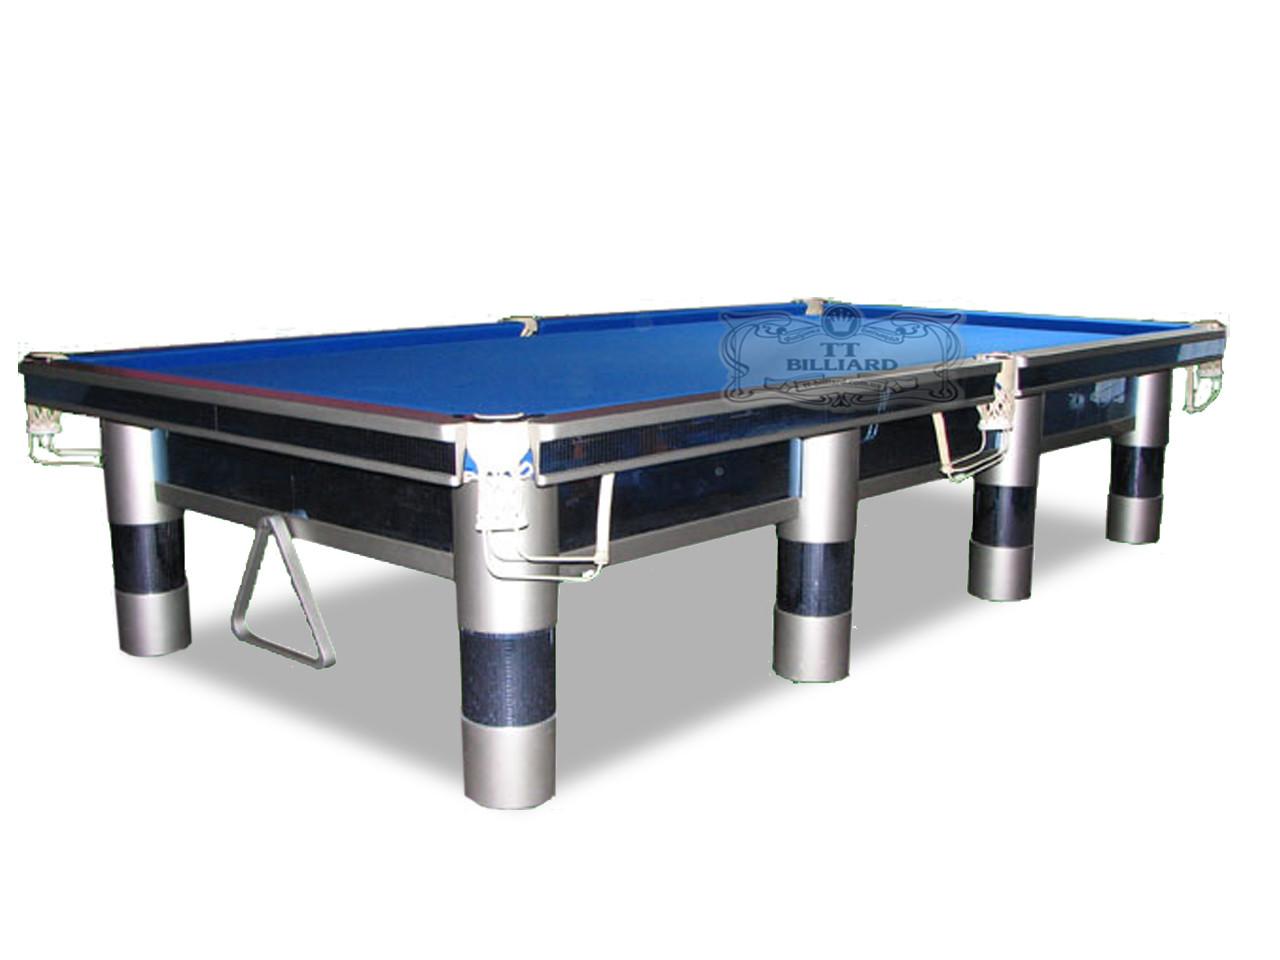 Бильярдный стол для пула ХАЙТЕК 10ф ардезия 2.8м х 1.4м